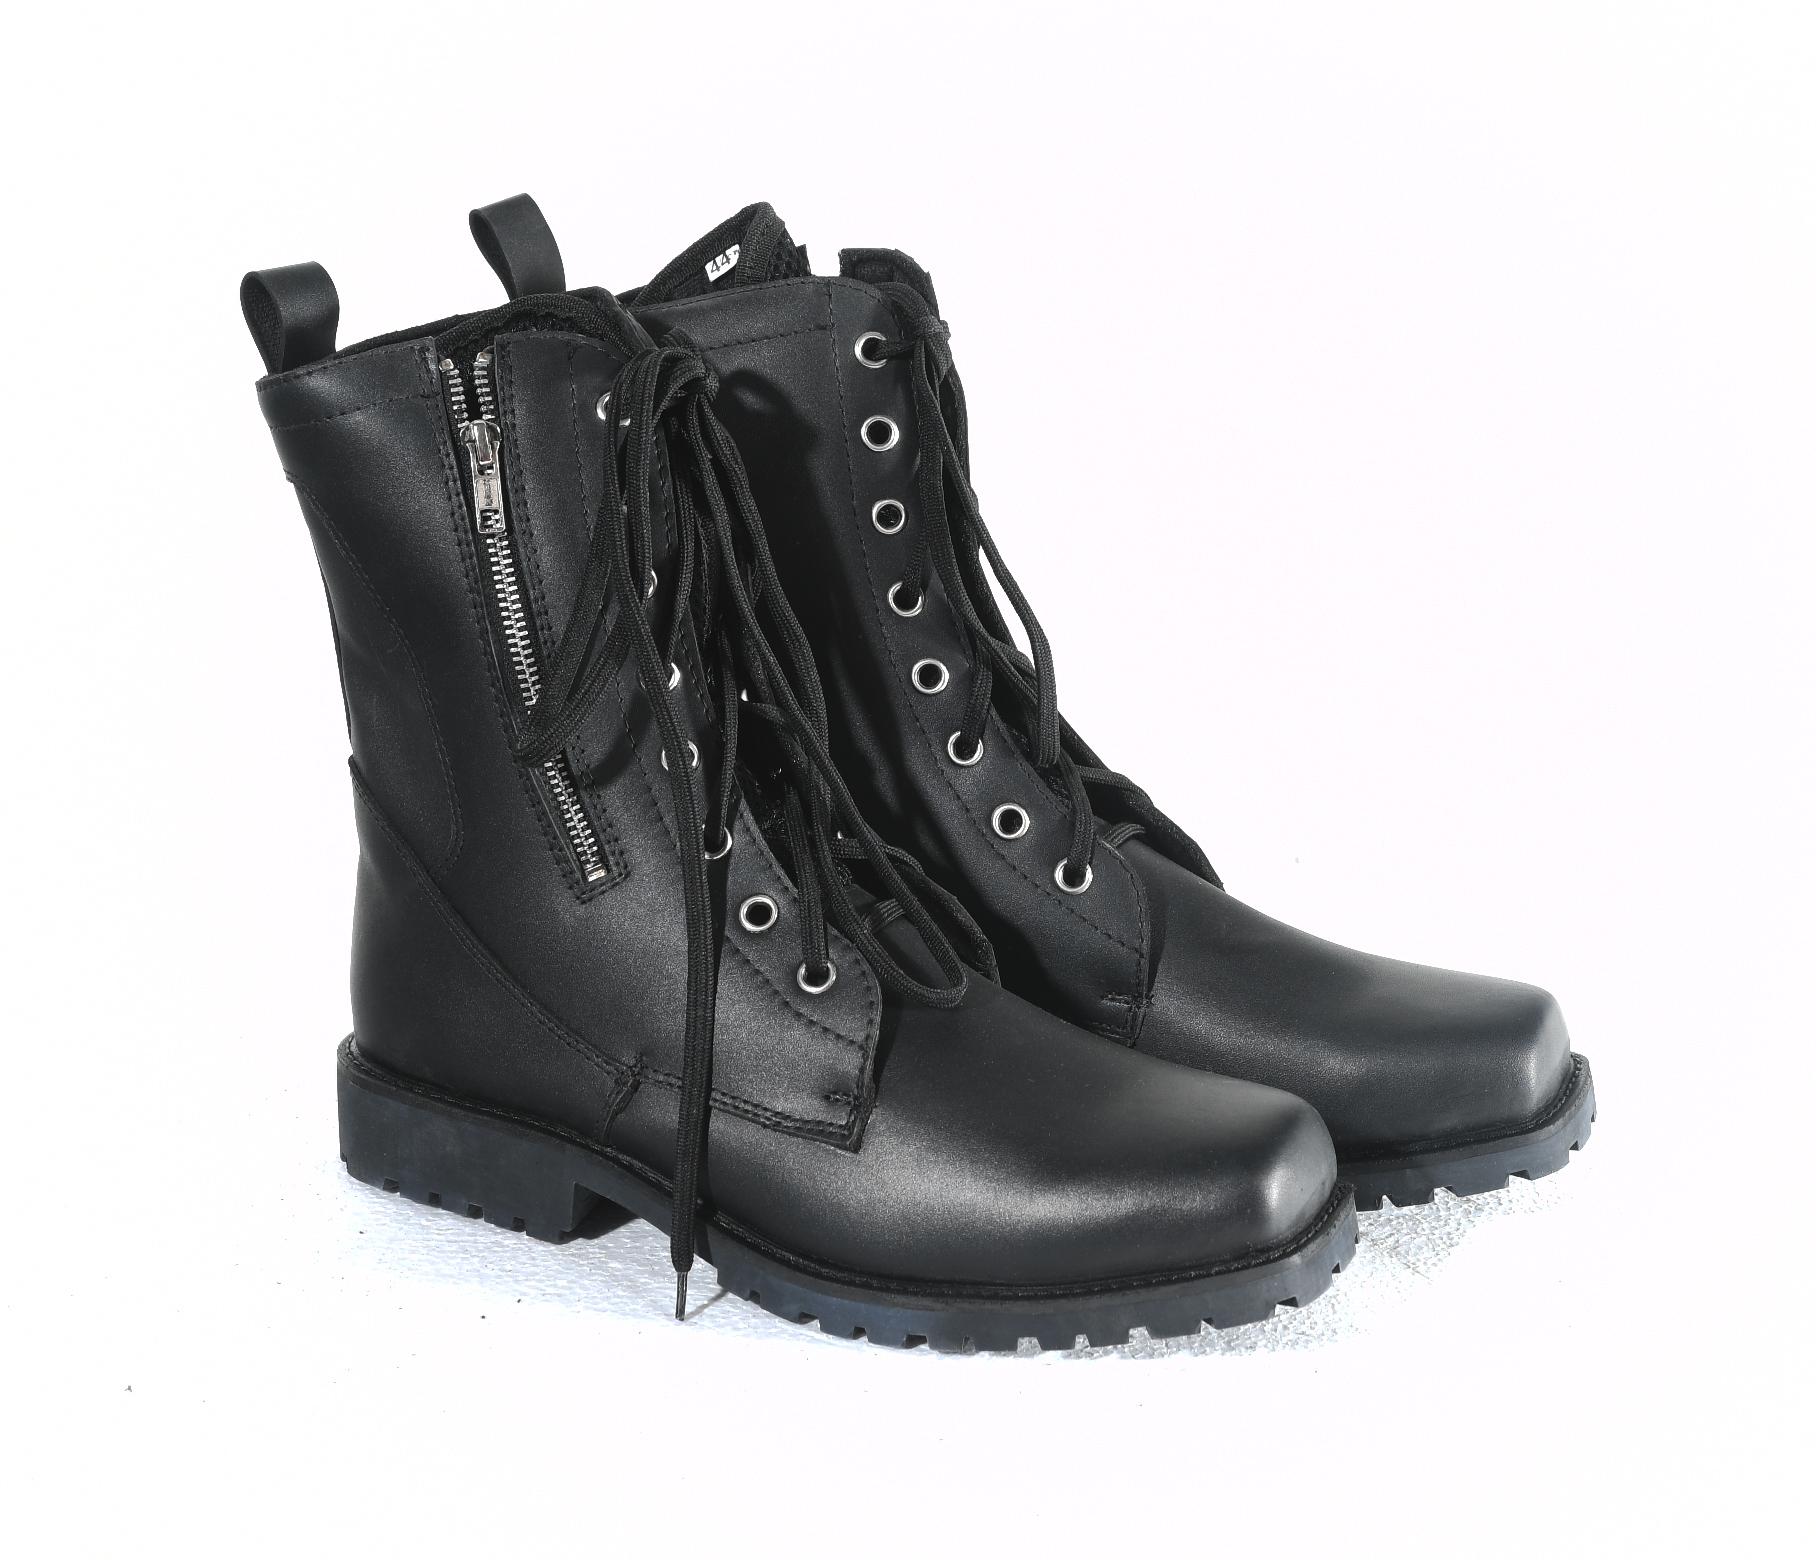 Mc boots, RANGER Classic Leather